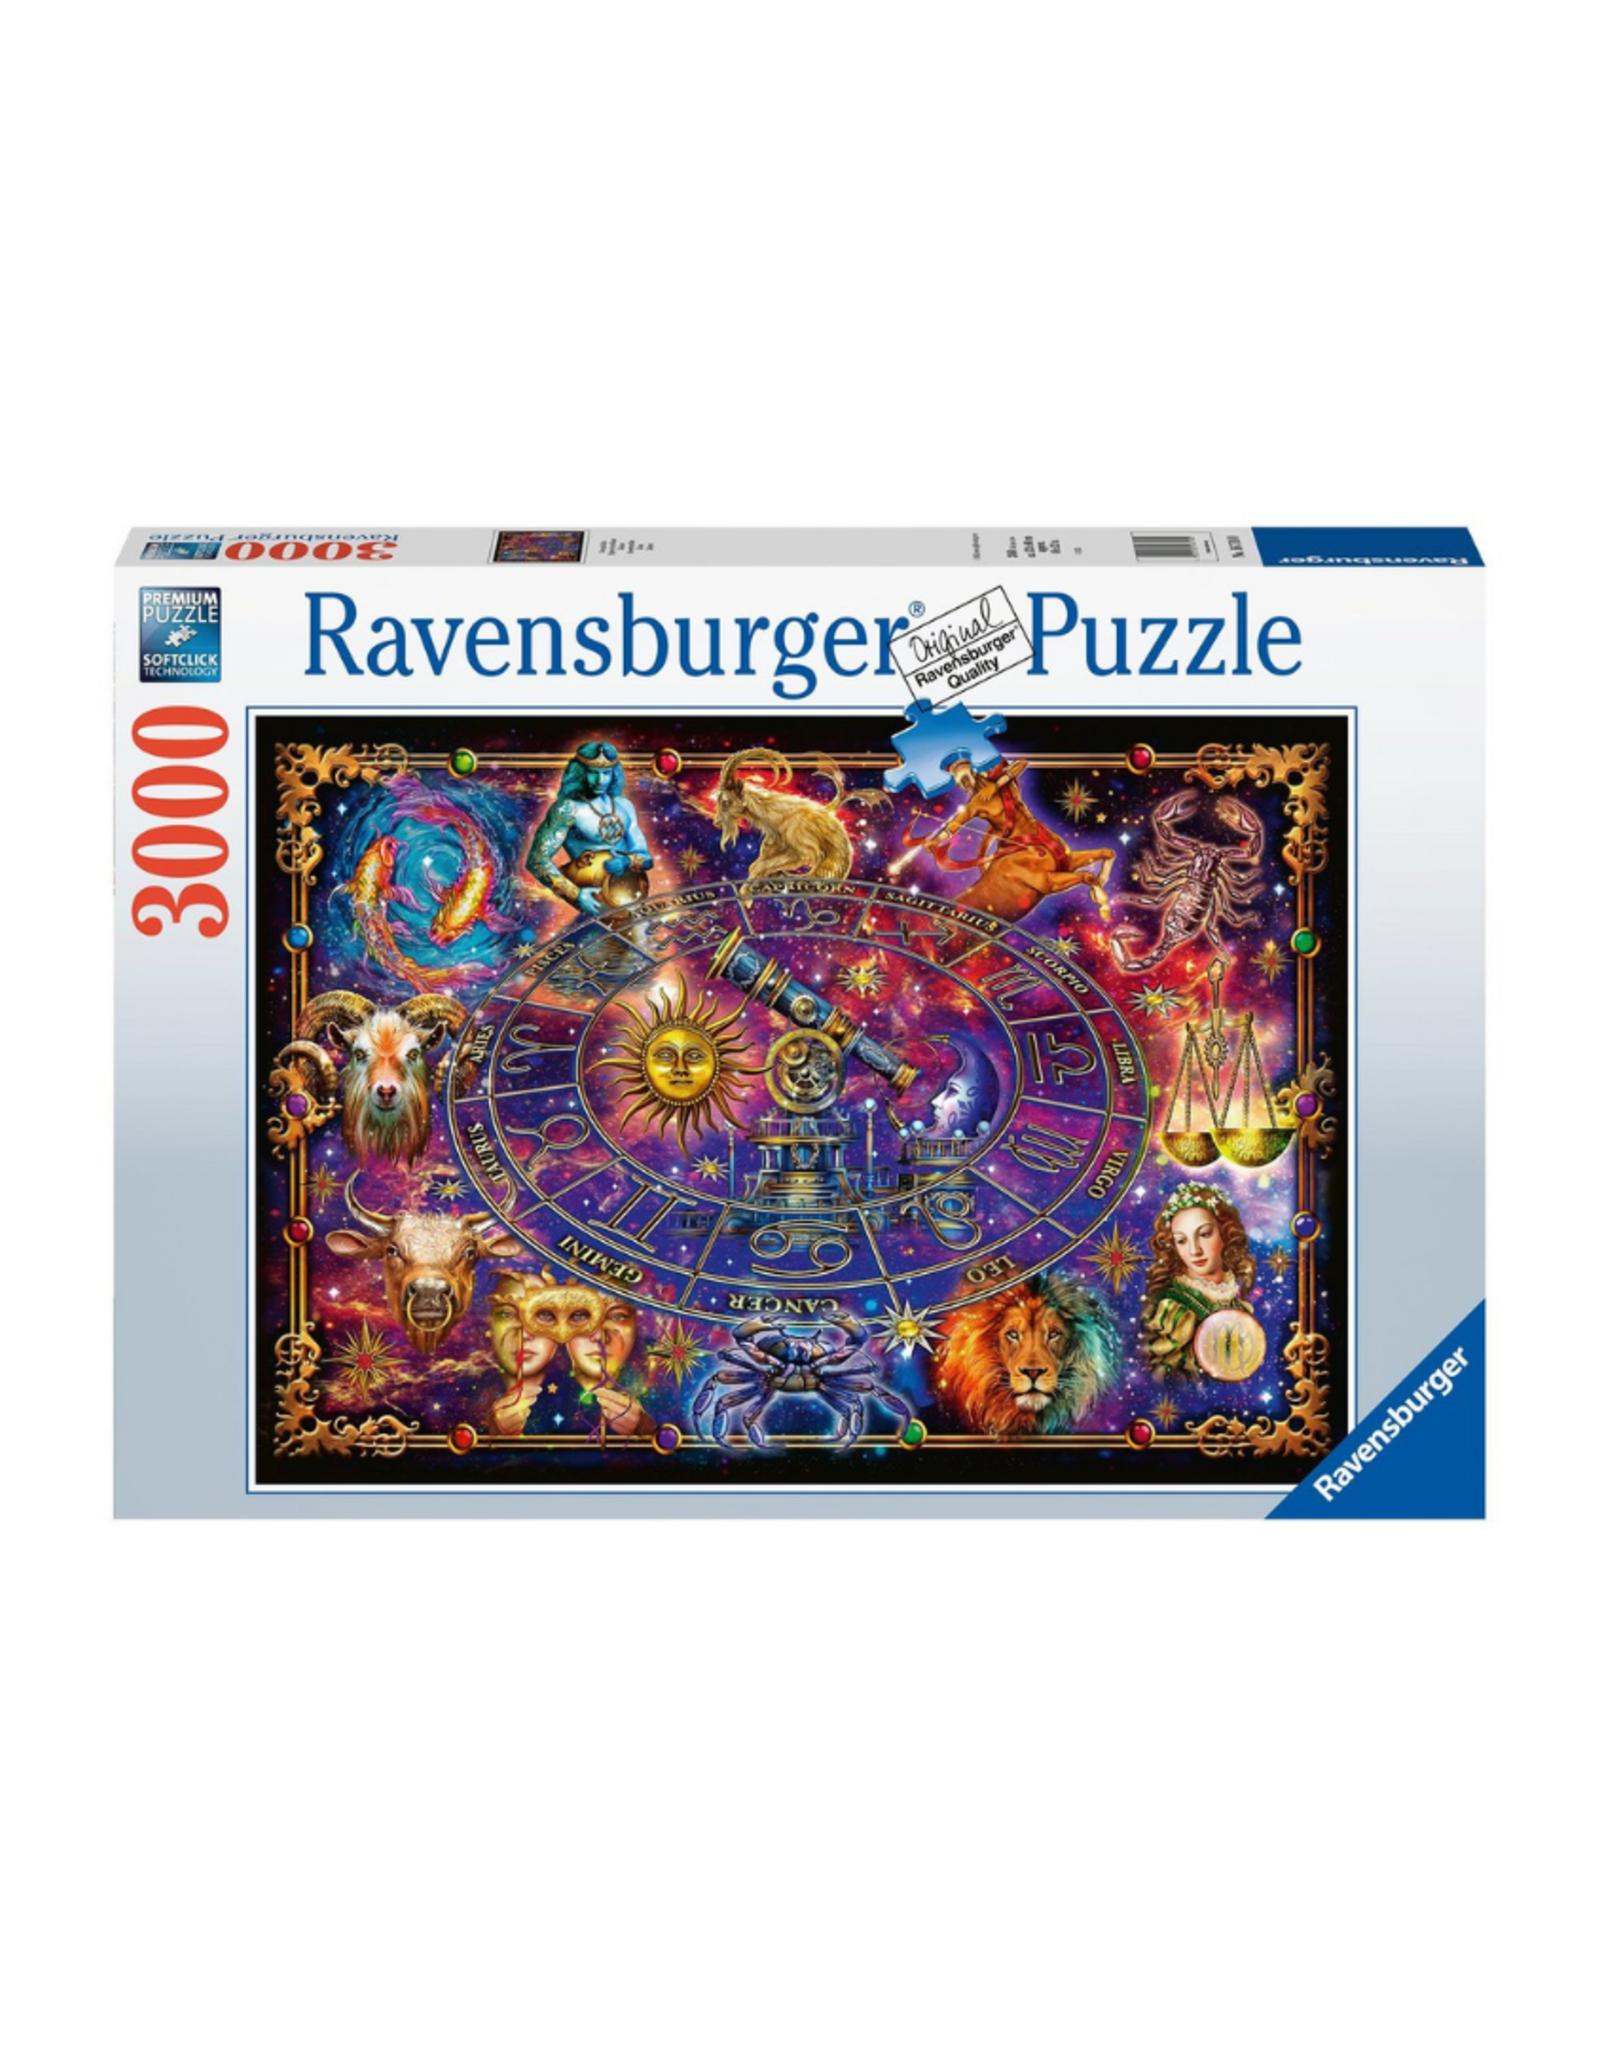 Ravensburger Zodiac 3000pc Puzzle